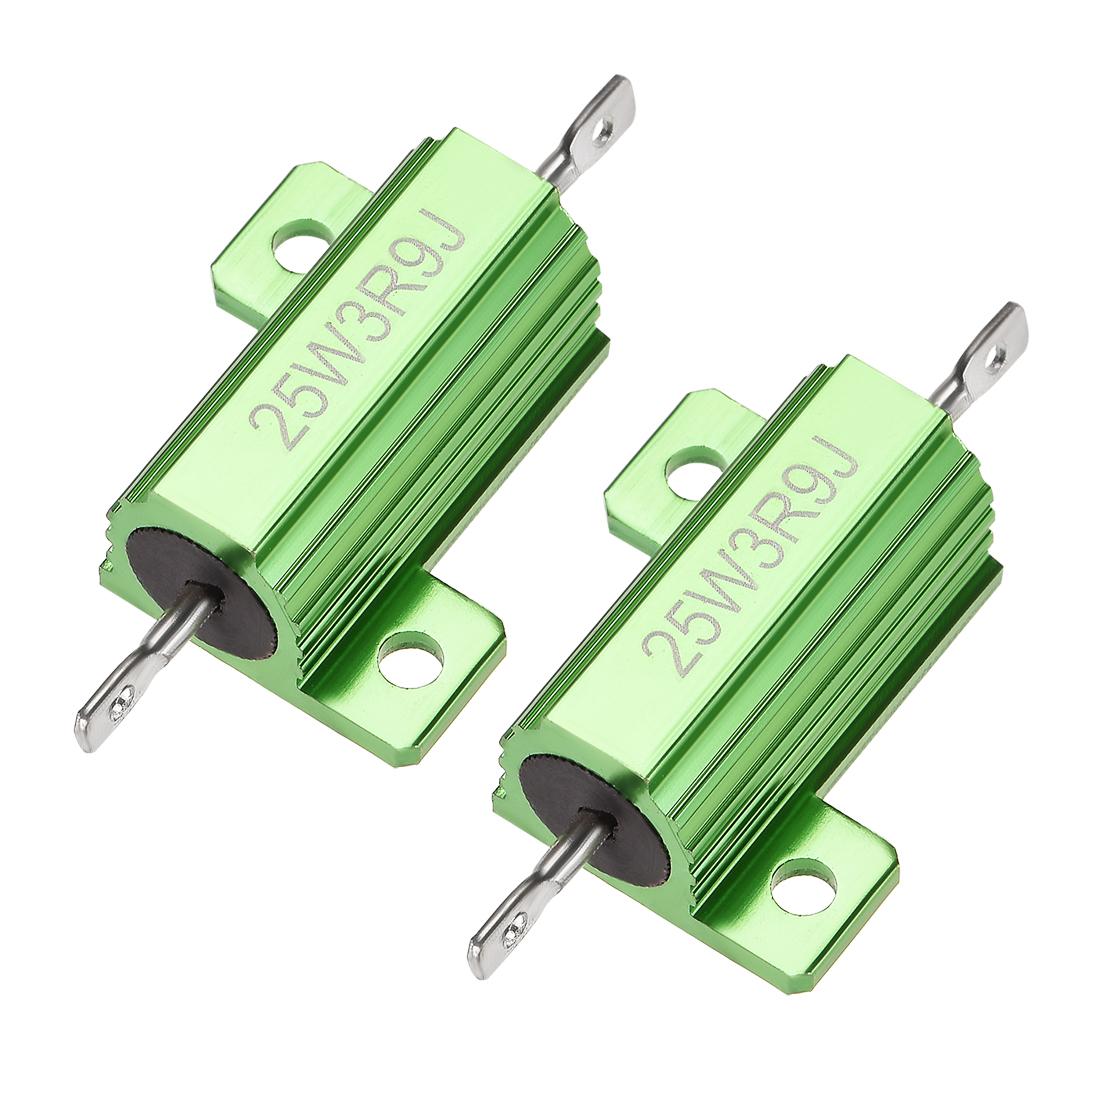 25W 3.9 Ohm 5% Aluminum Housing Resistor Wirewound Resistor Green Tone 2 Pcs